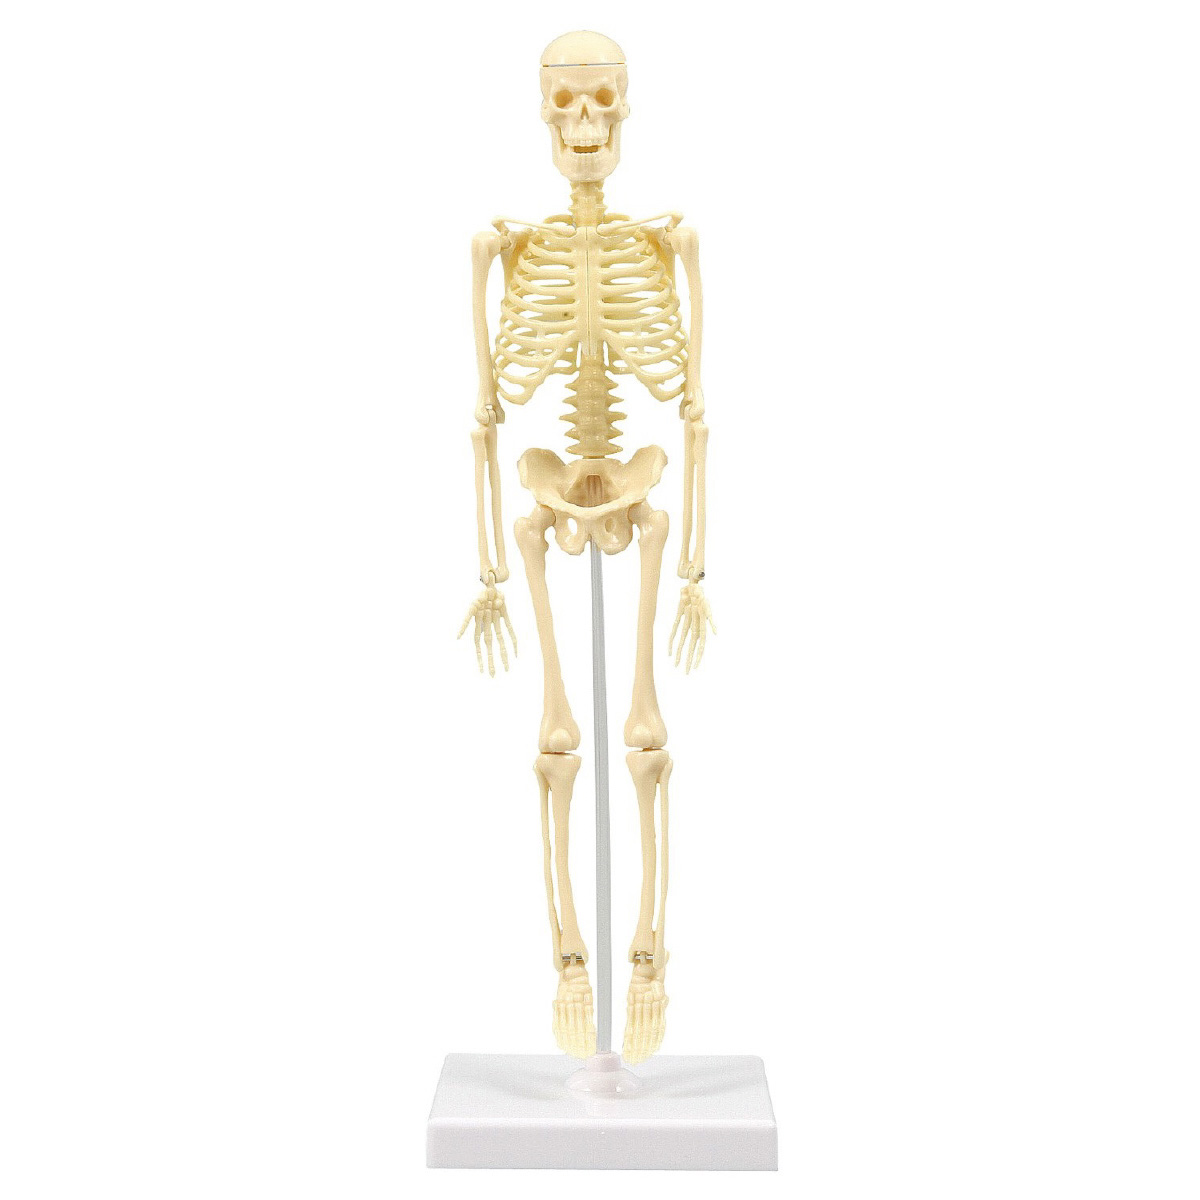 人体骨格模型 30cm 模型 からだ 理科 キッズ 小学生 学校 教材 備品 自由研究 知育玩具